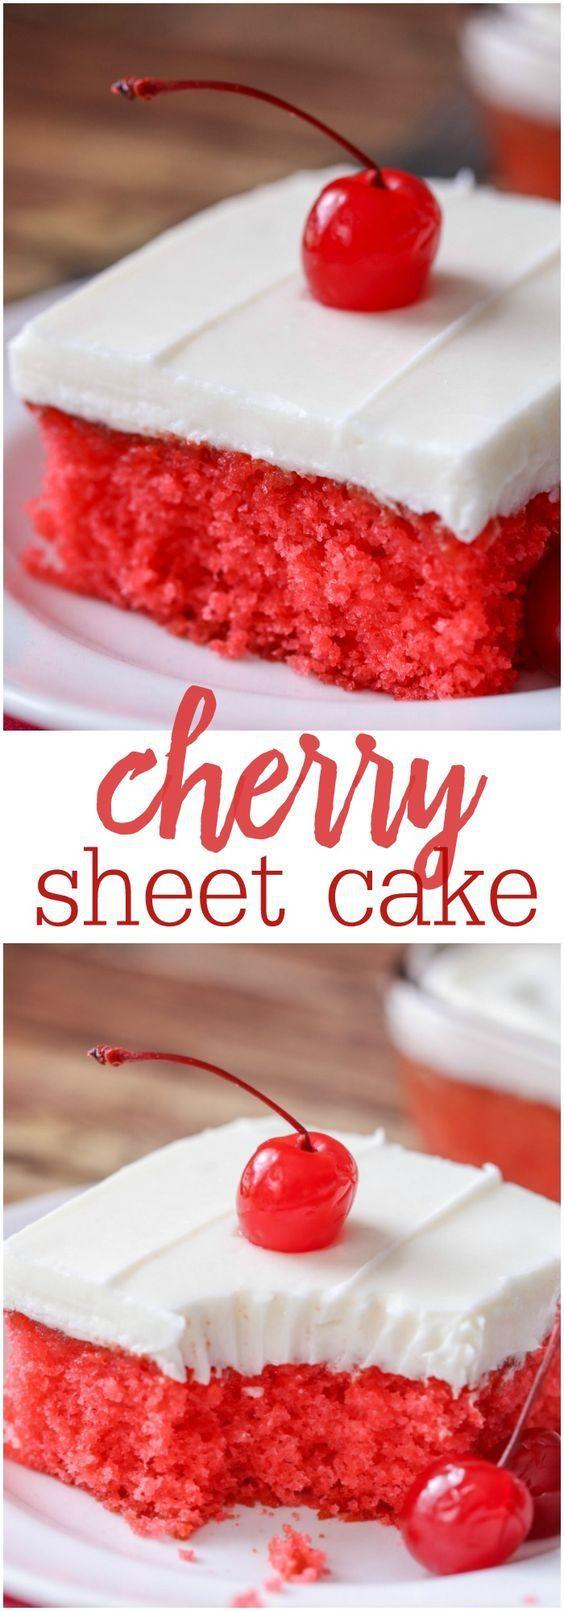 How To Make Moist High Ratio Cake